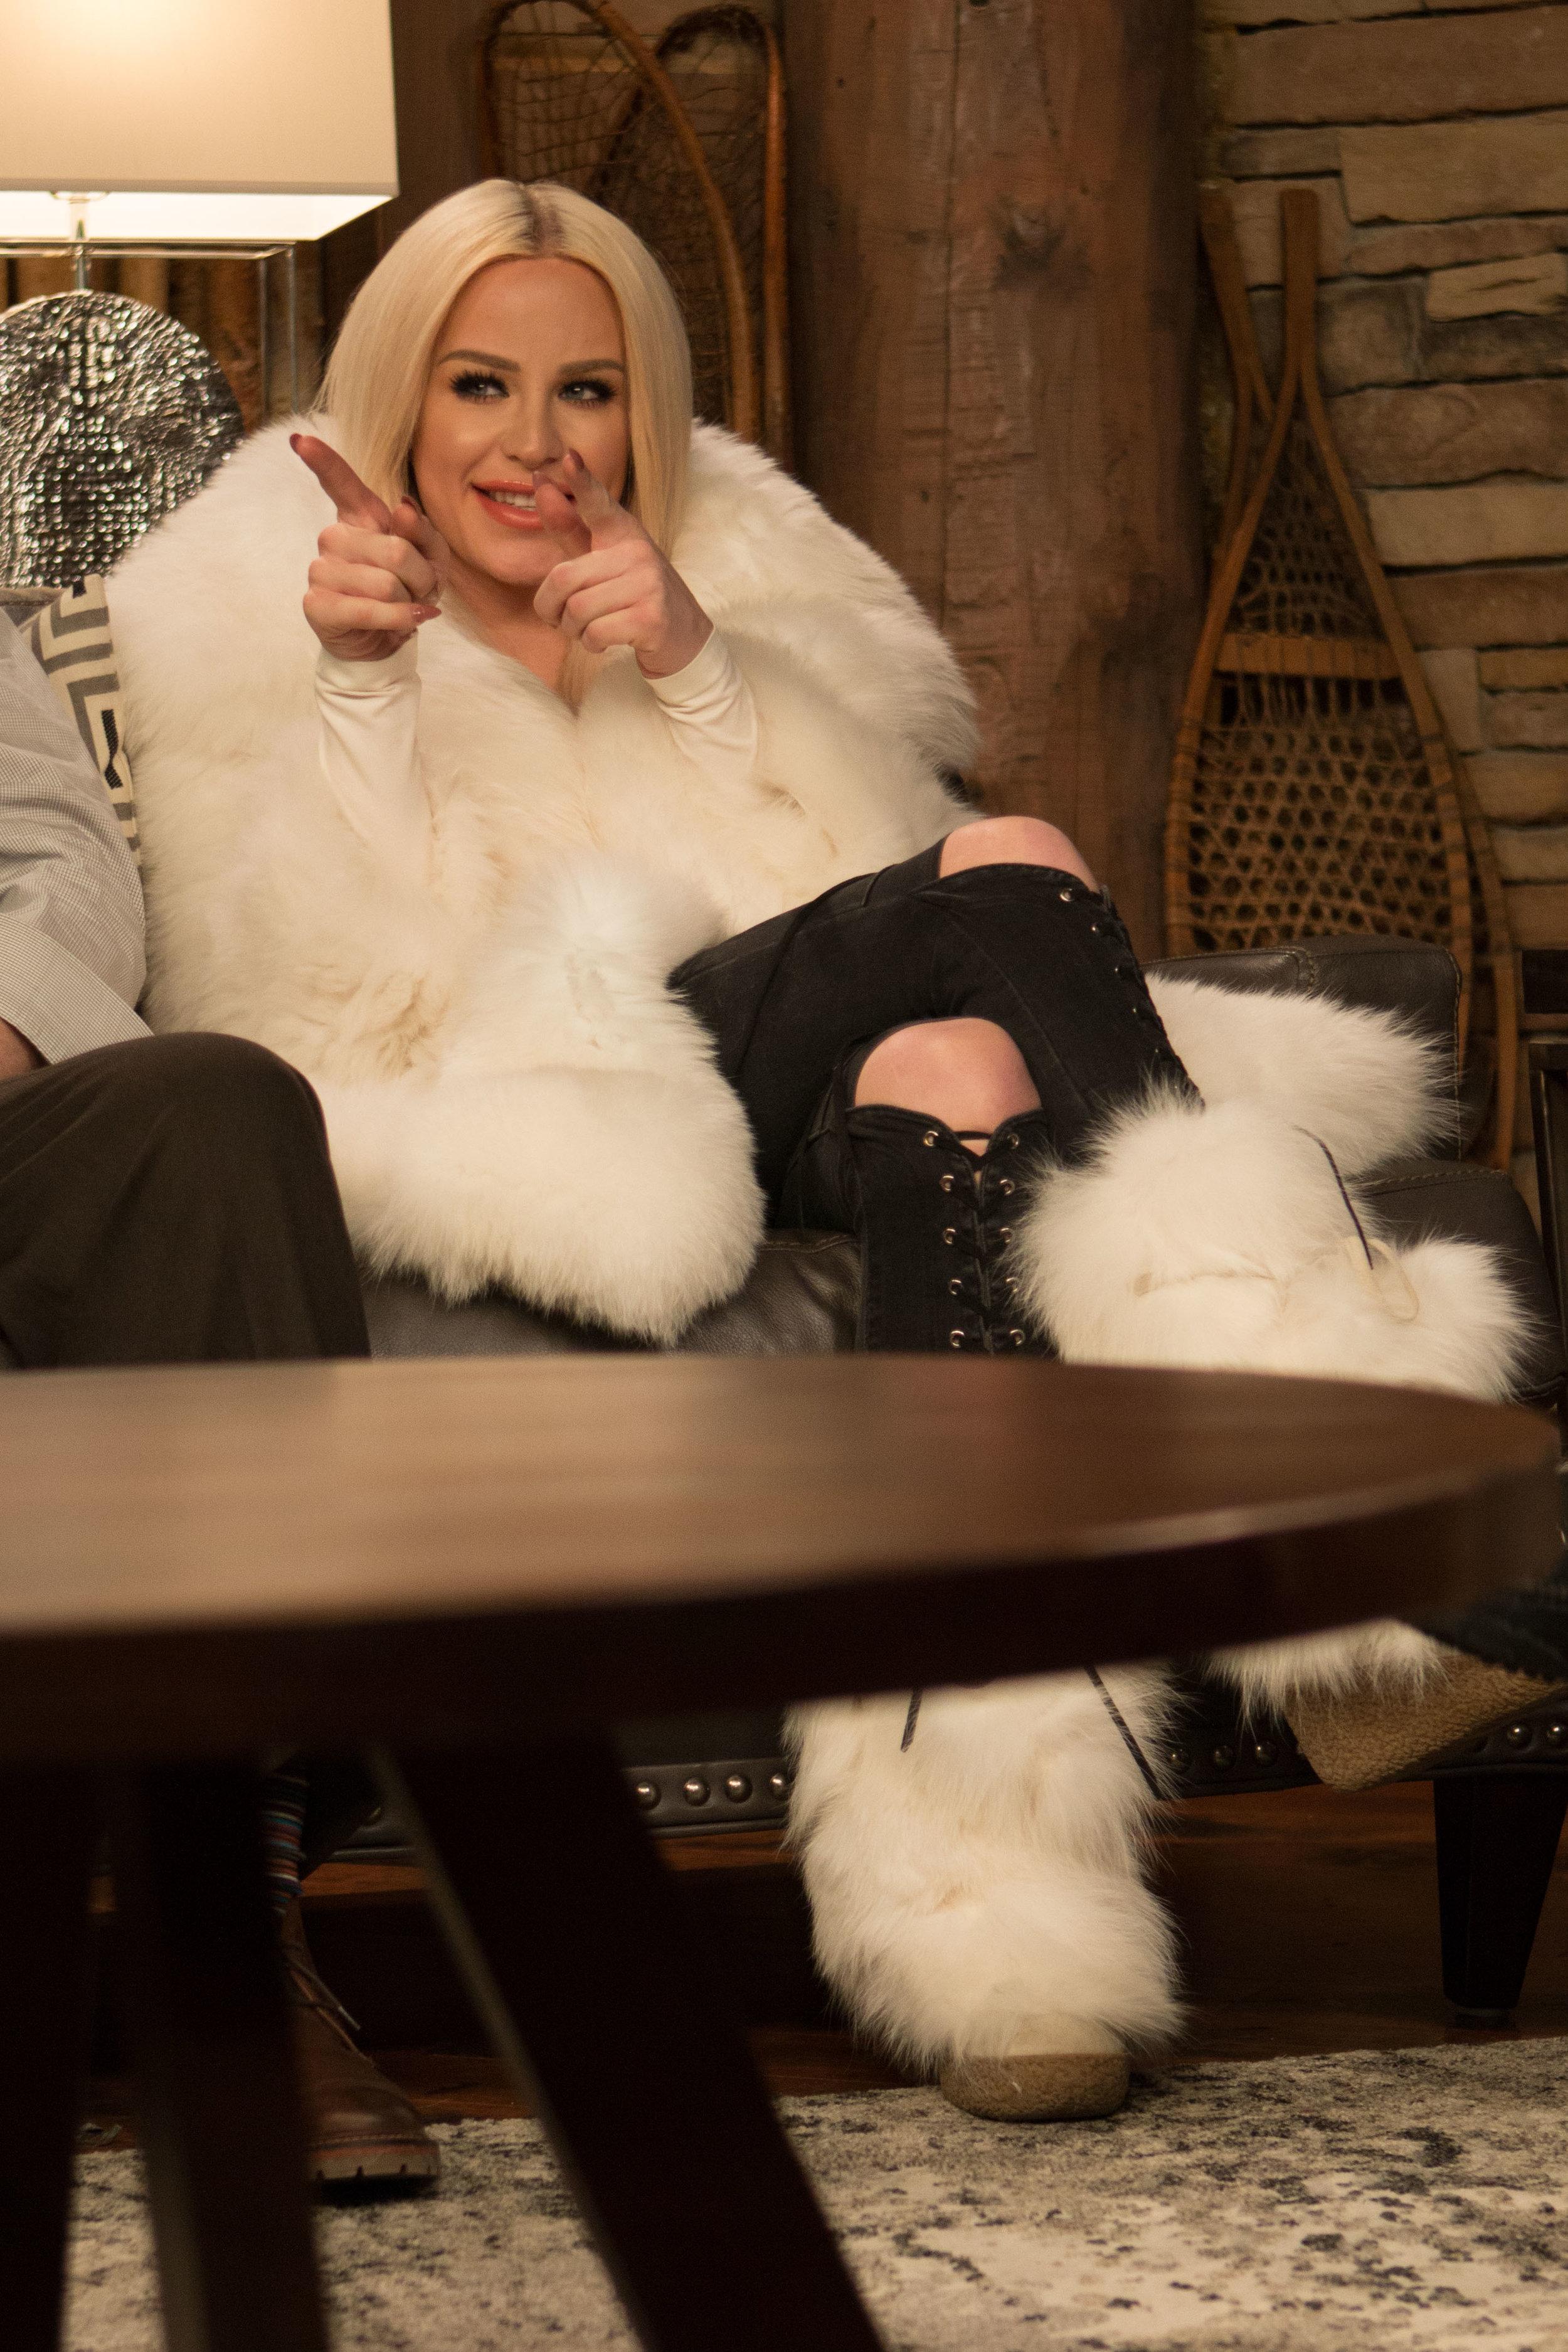 Sundance_Guests_GiGi.Gorgeous.jpg